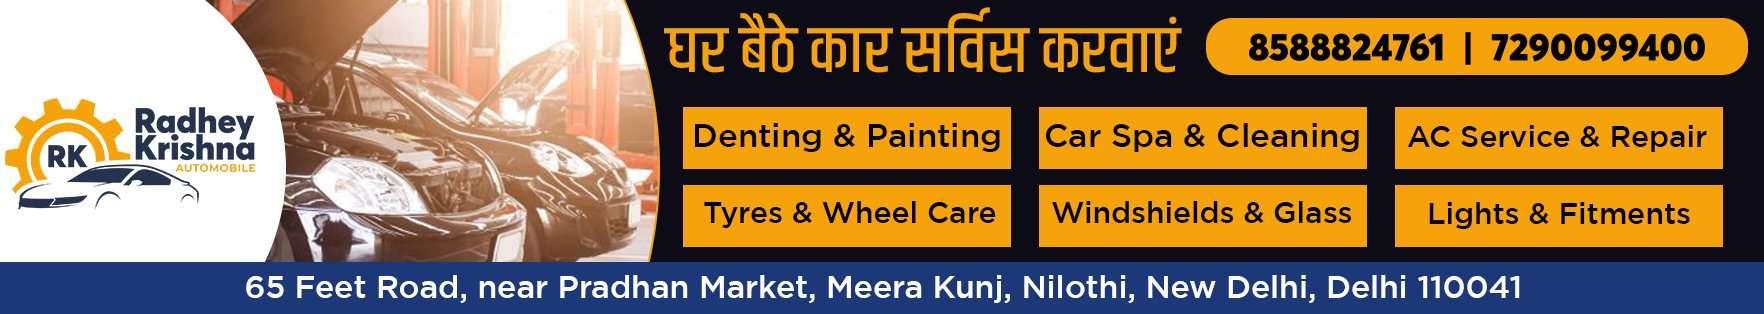 Radhey Krishna Auto